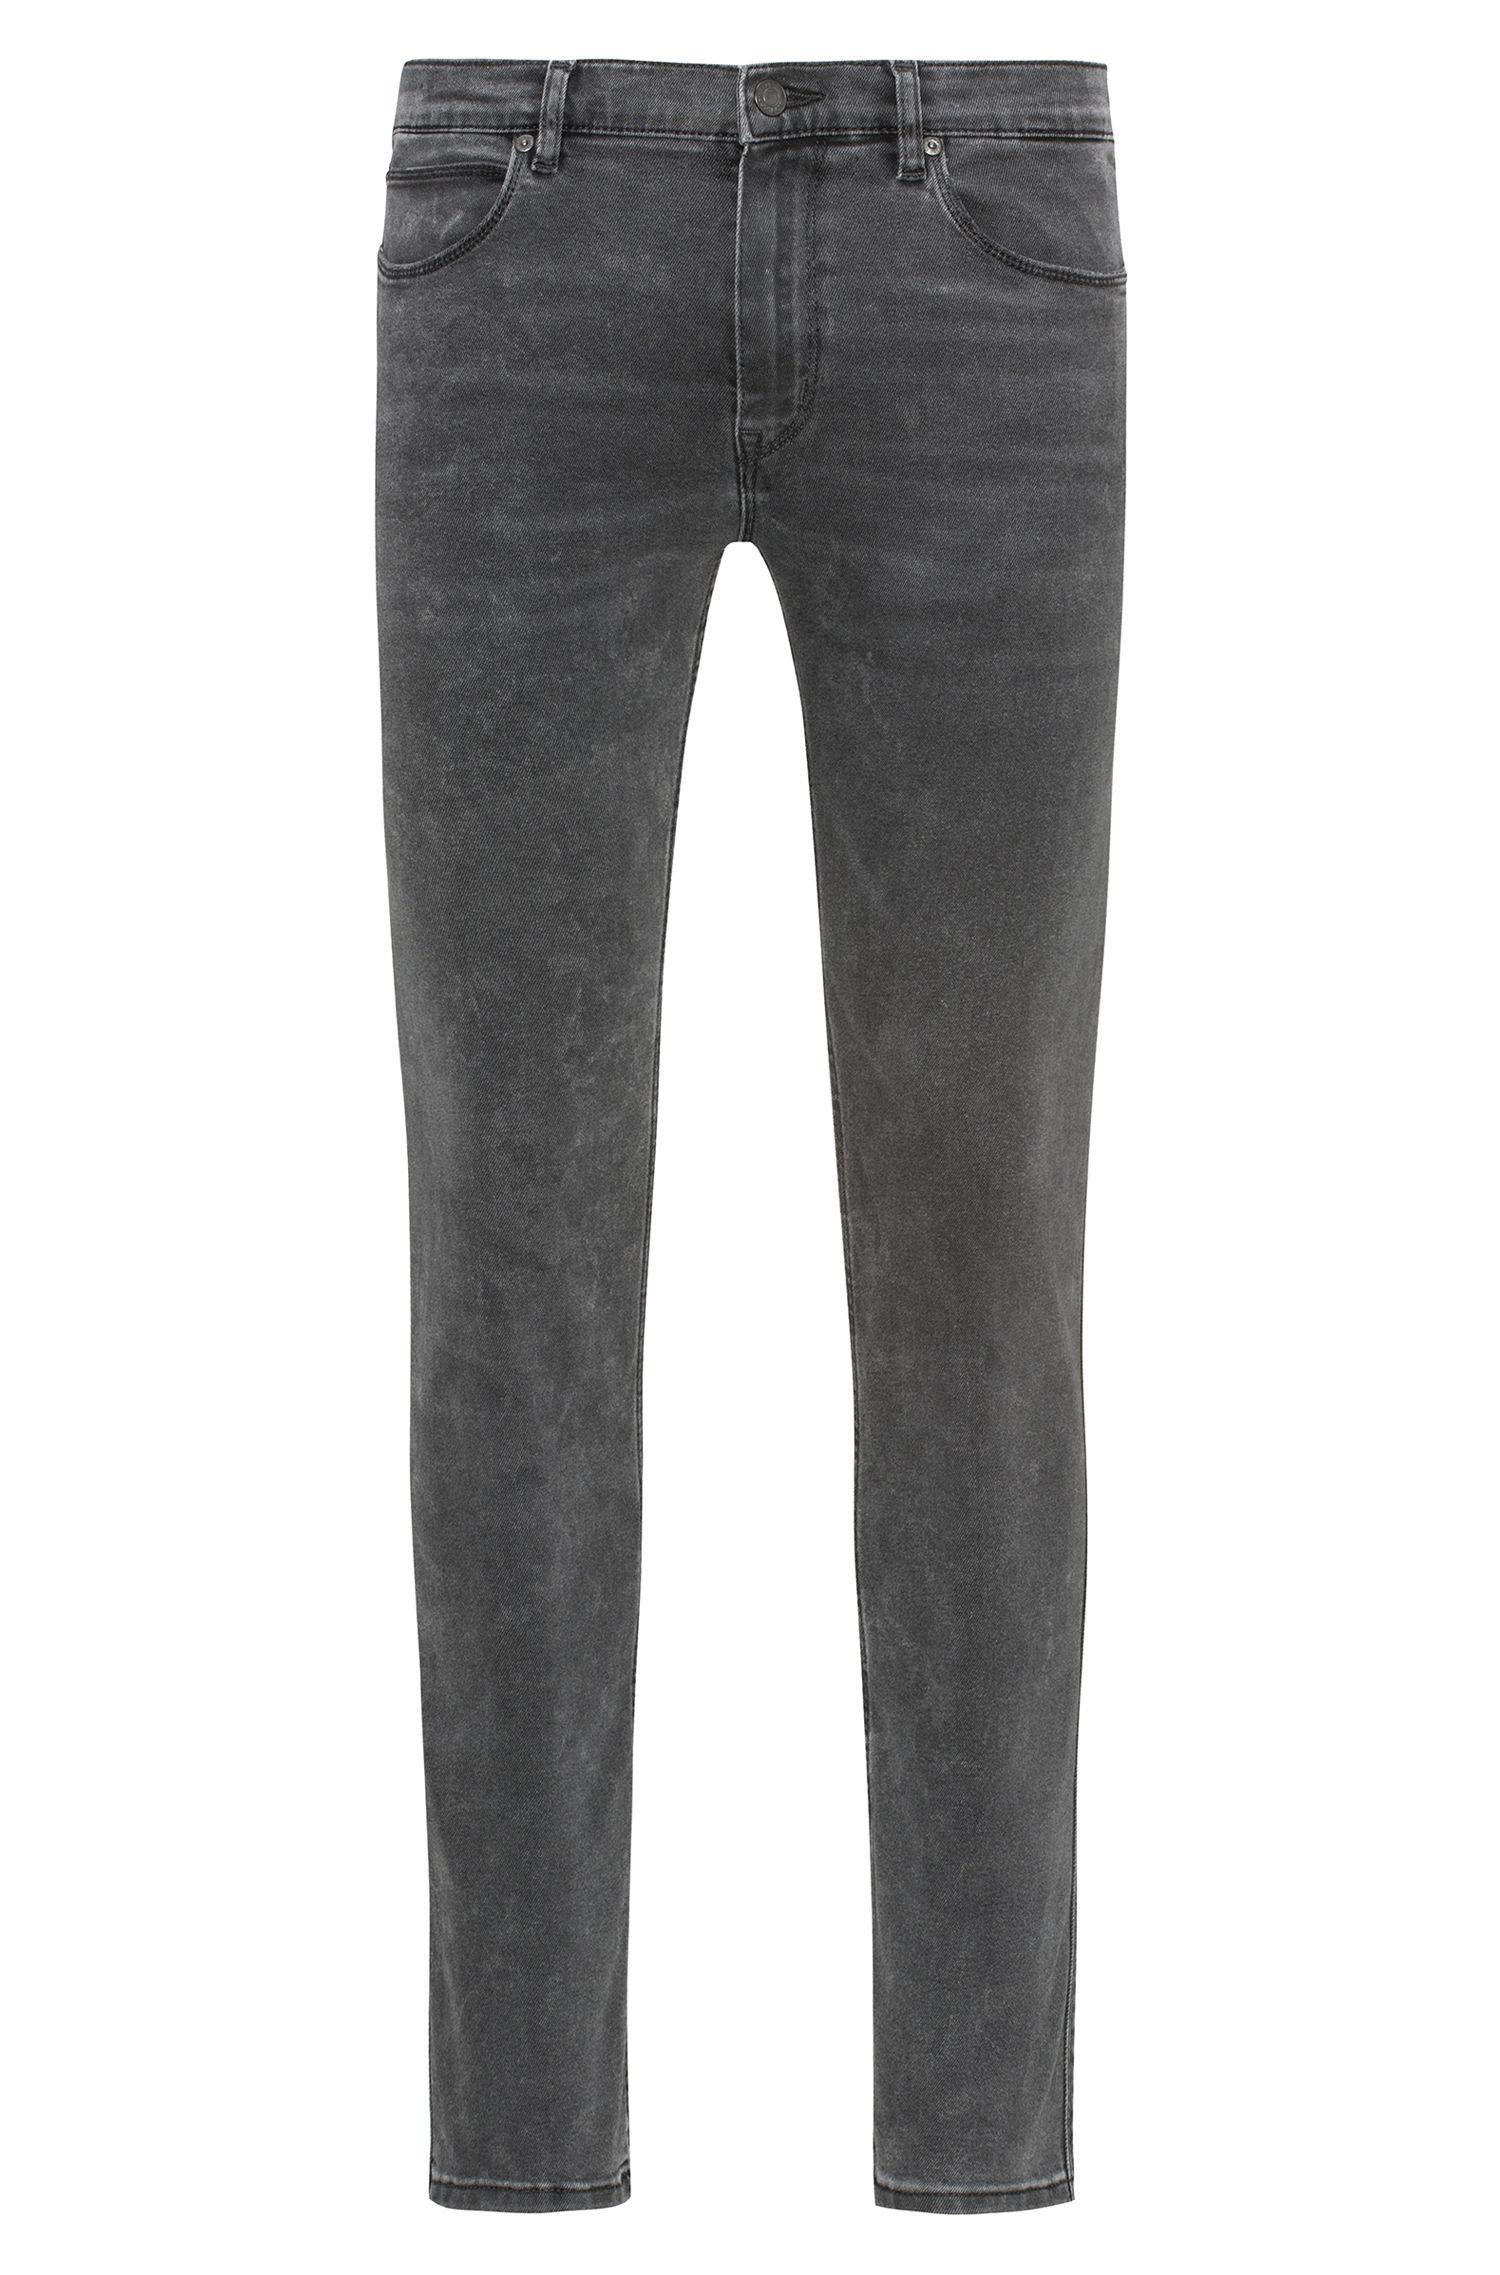 Skinny-Fit Jeans aus Stretch-Denim in Used-Optik